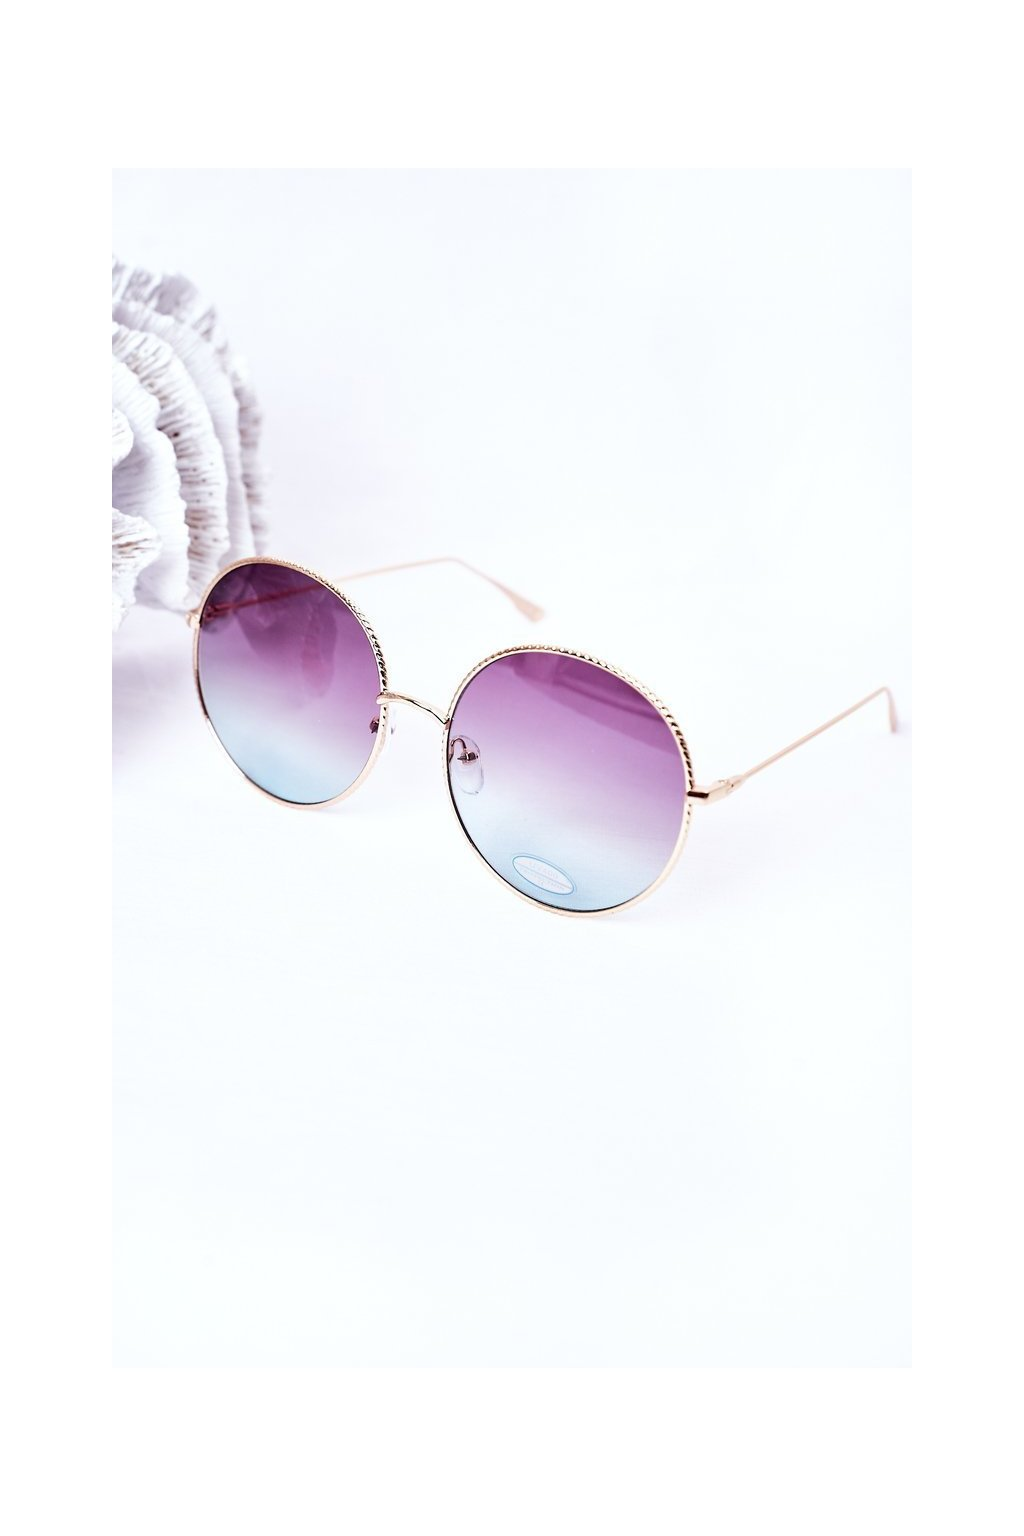 Módne slnečné okuliare LOOKS STYLE modro-ružové LOOKS001 BLUE/PINK